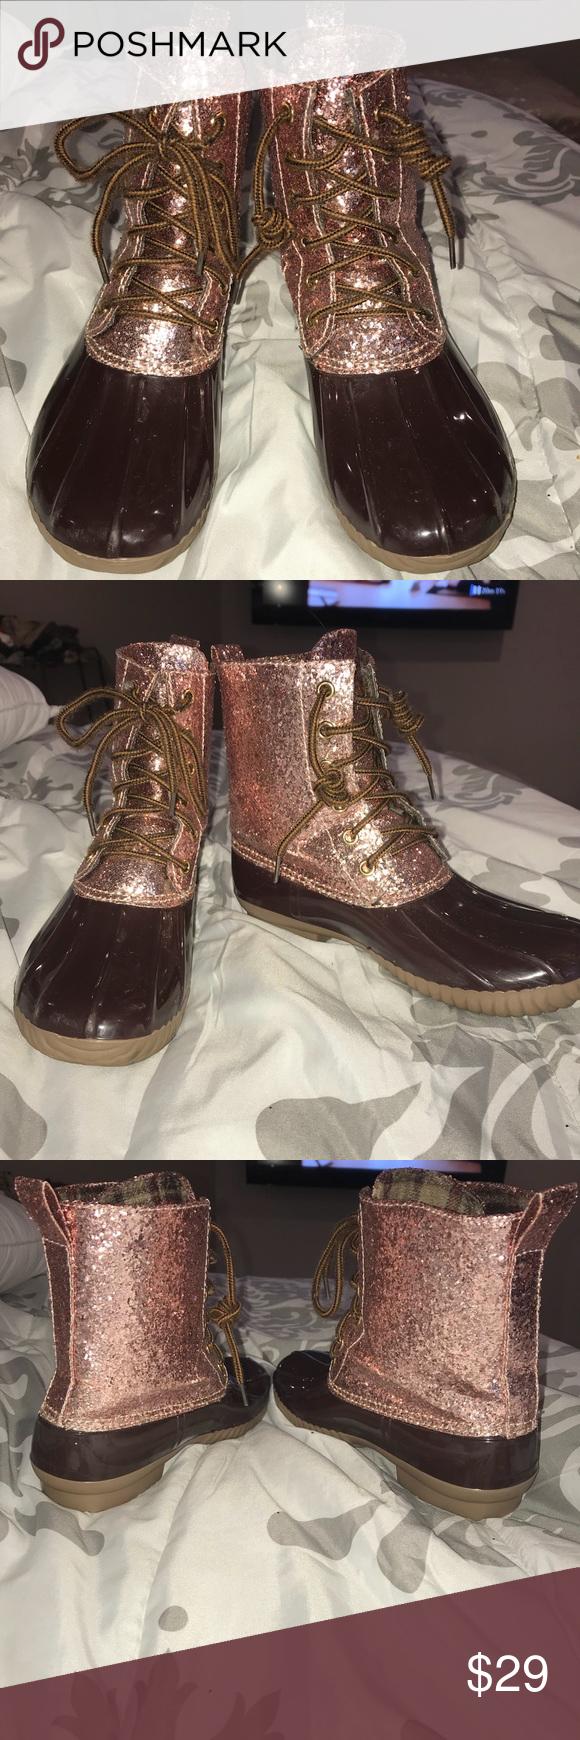 1cb1277ad237 YOKI Rose Gold Glitter Top Duck Boot SzS 5-6 Women EUC- No flaws and ...